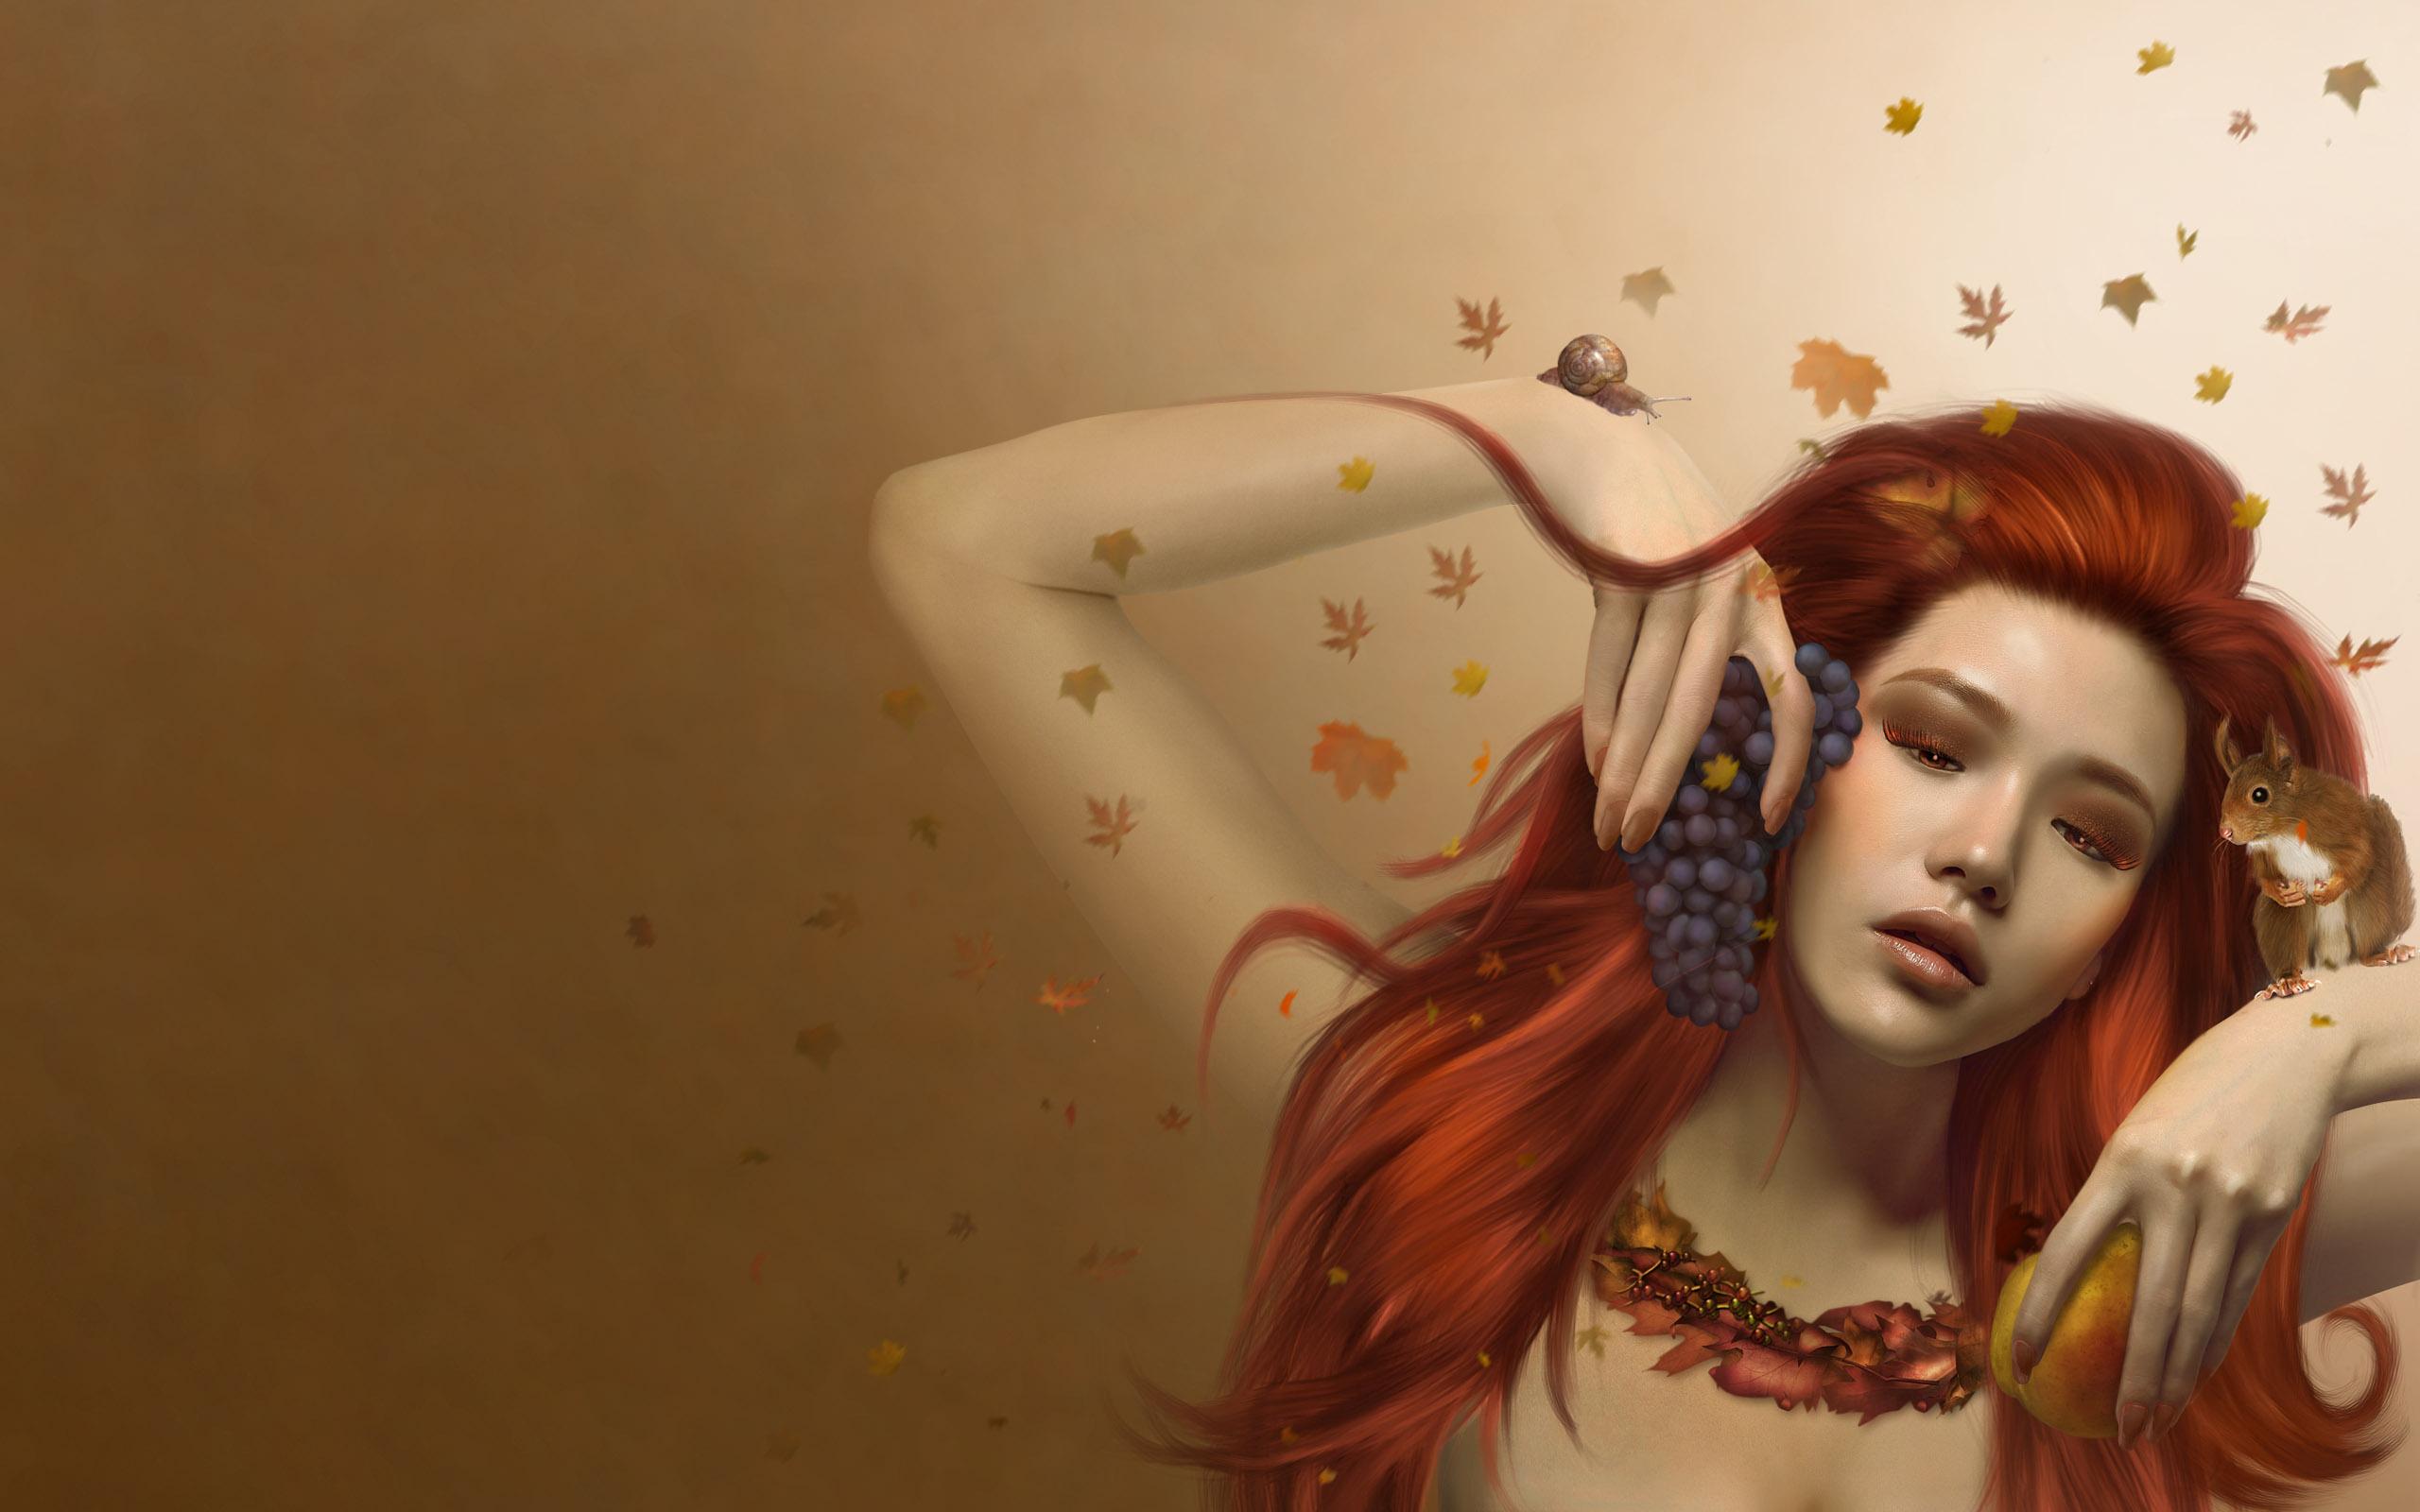 Beautiful Digital Art Desktop Wallpapers In HD Quality 2013 Edition 2560x1600